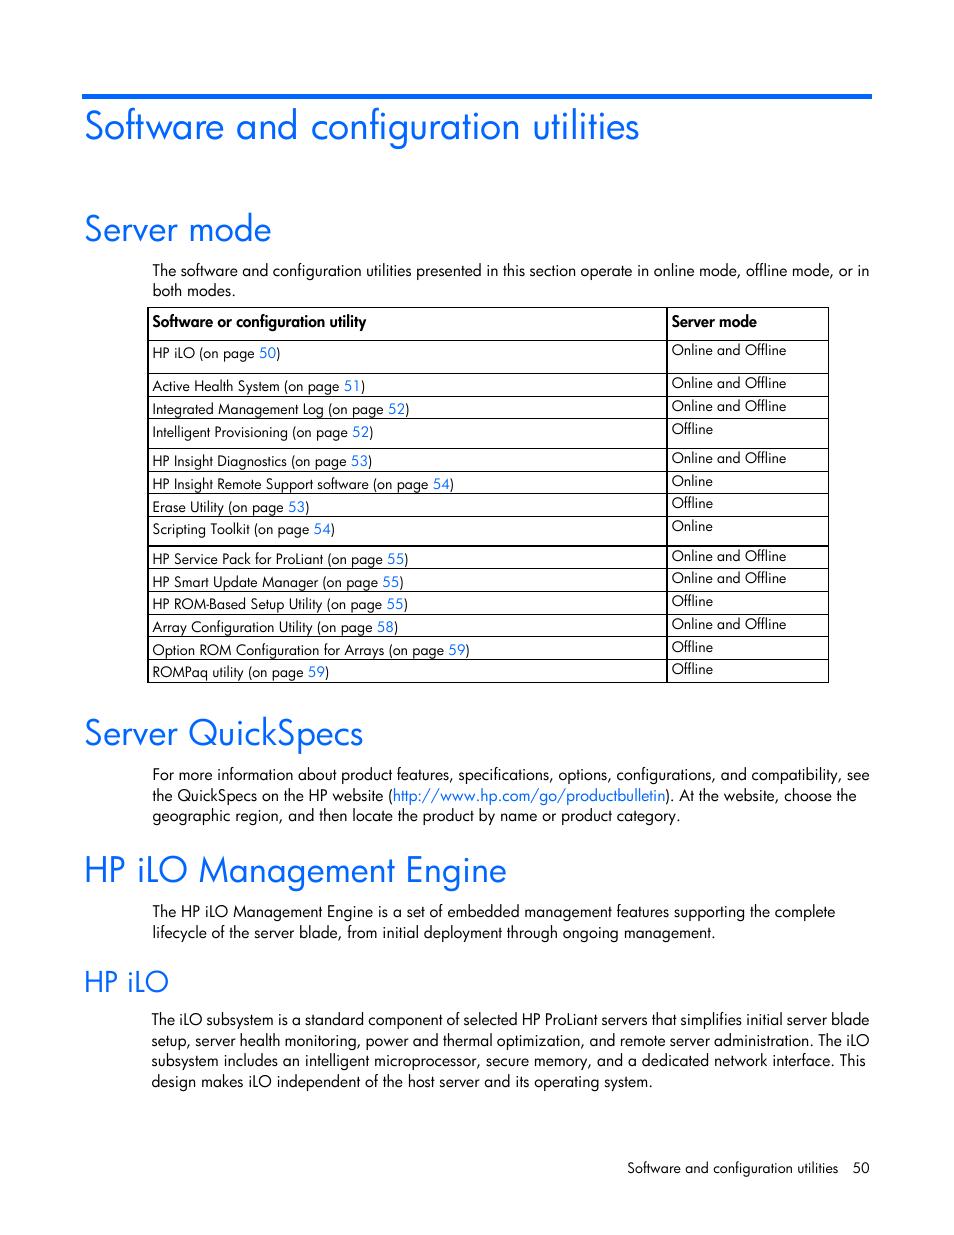 Software and configuration utilities, Server mode, Server